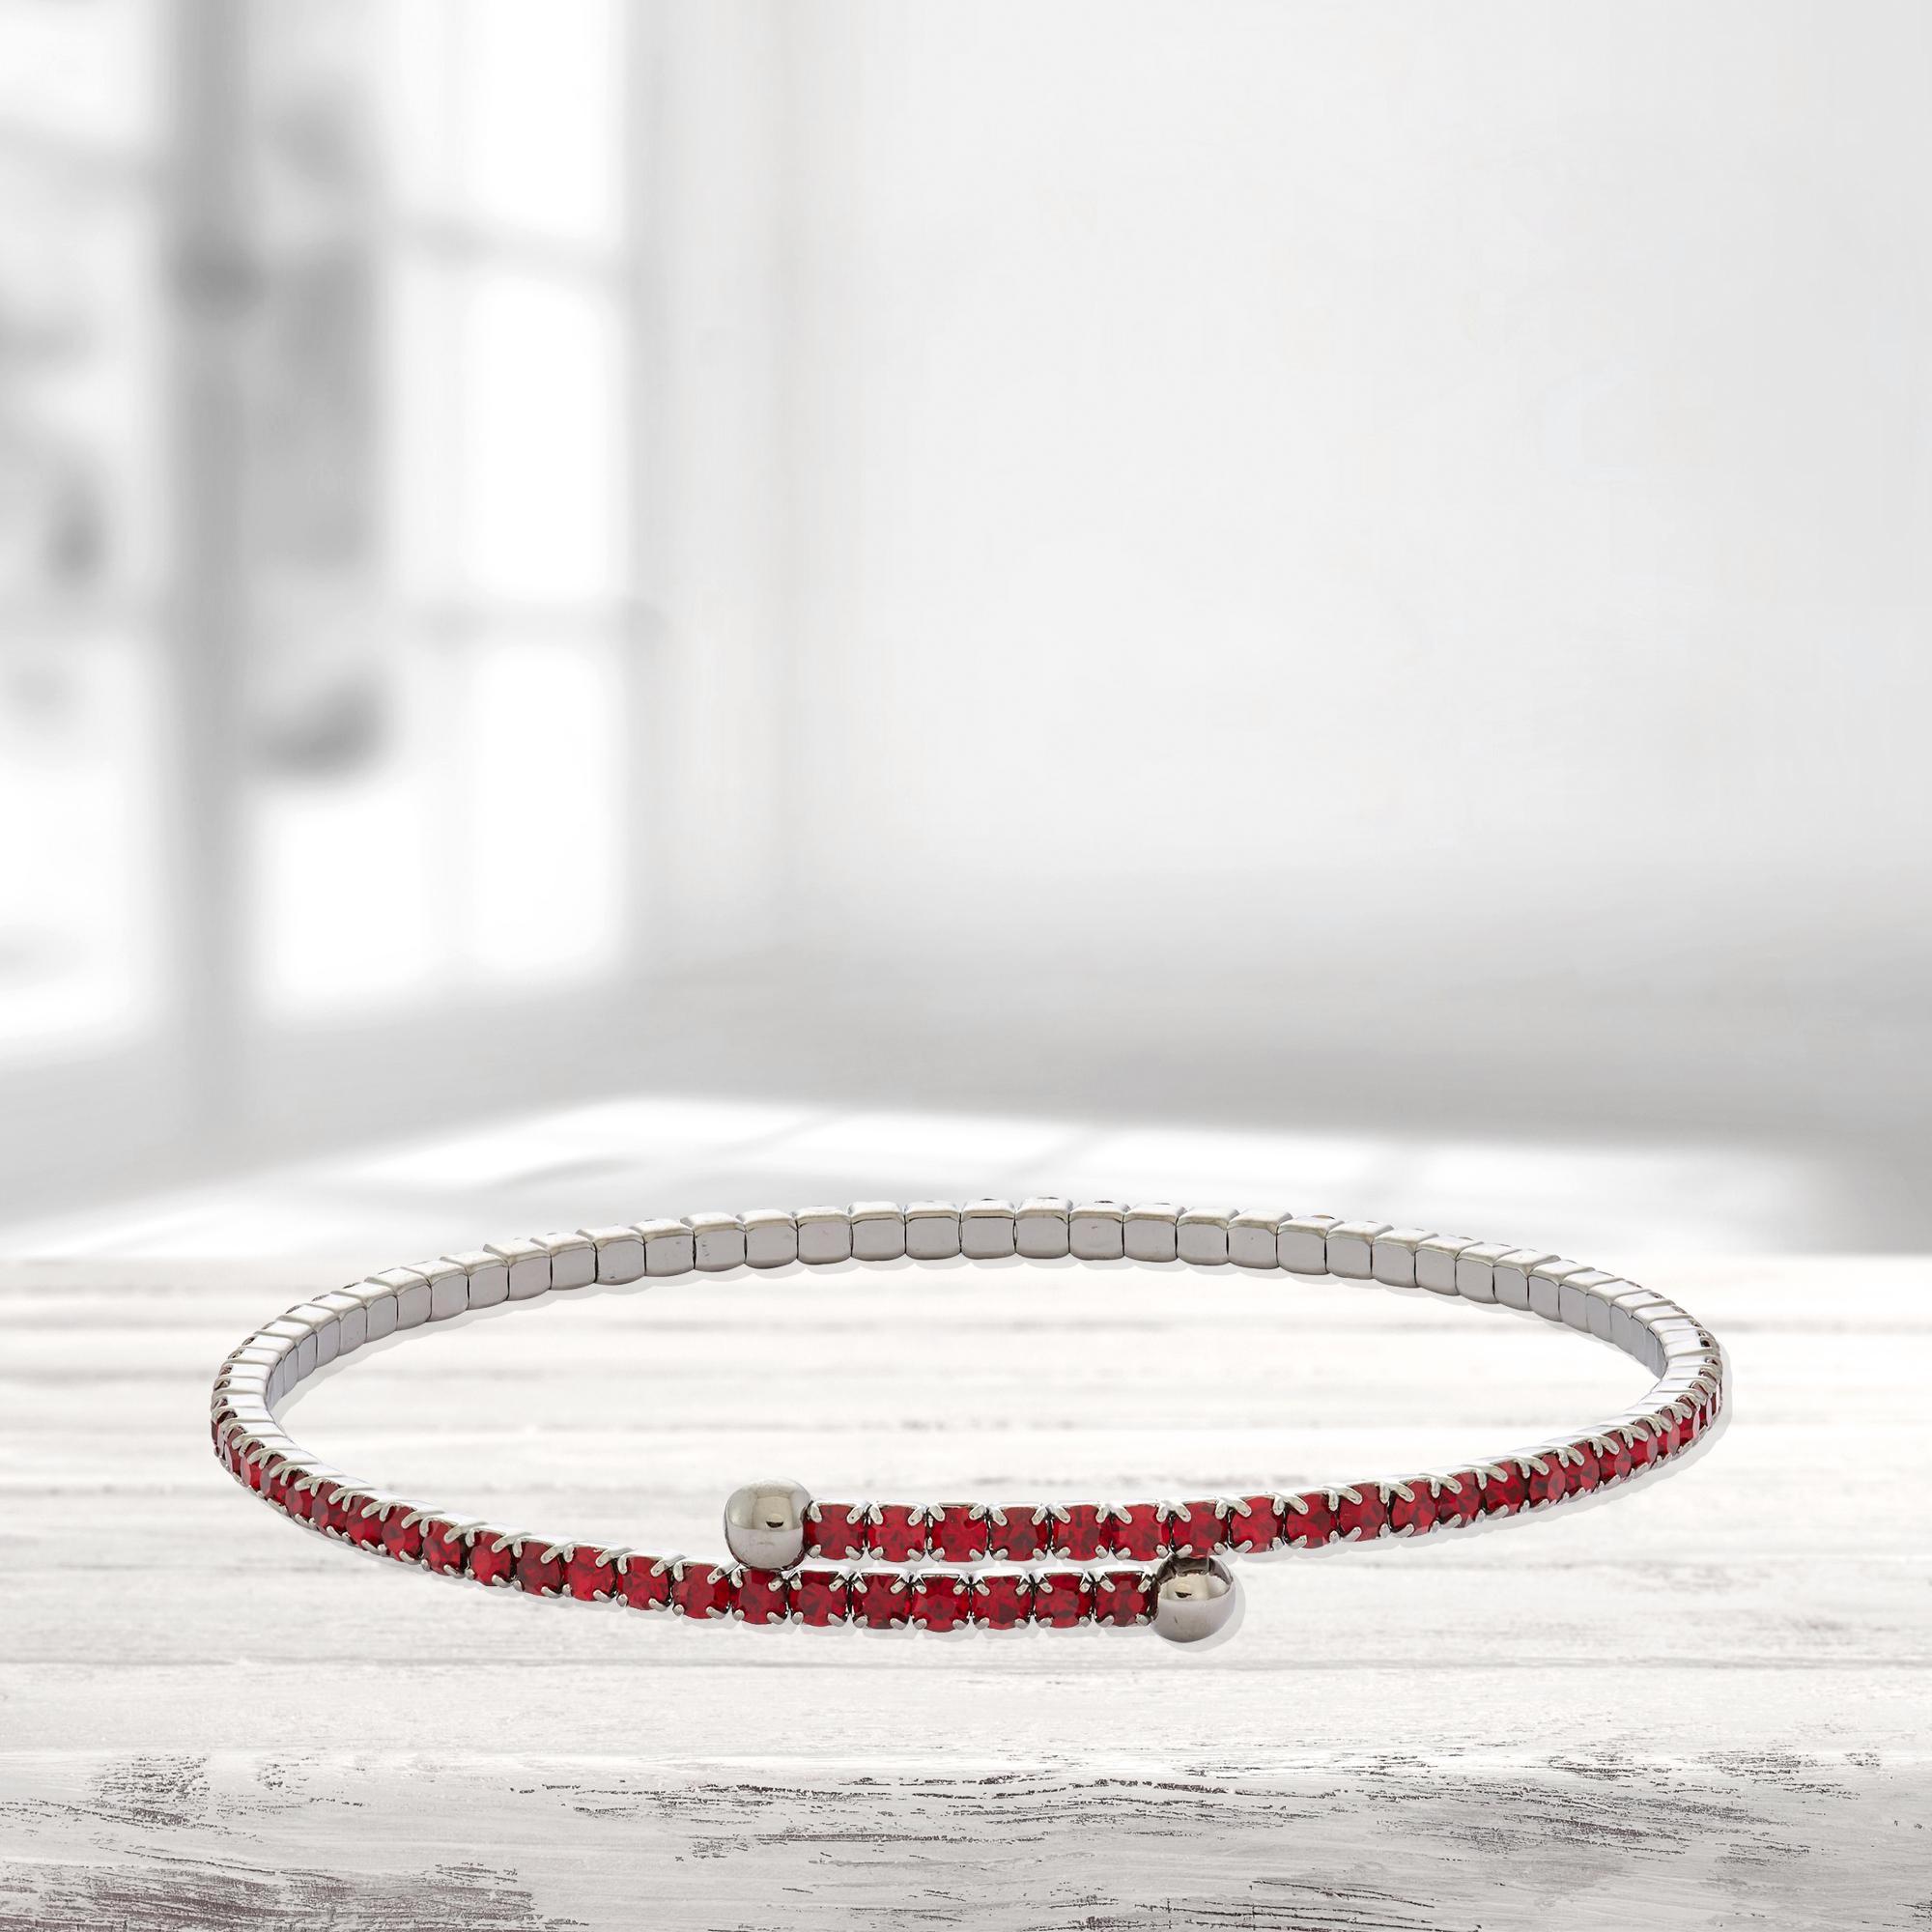 Womens-Ladies-Fashion-Accessories-Jewelry-Black-Rhodium-Plated-Bangle-Bracelet thumbnail 49